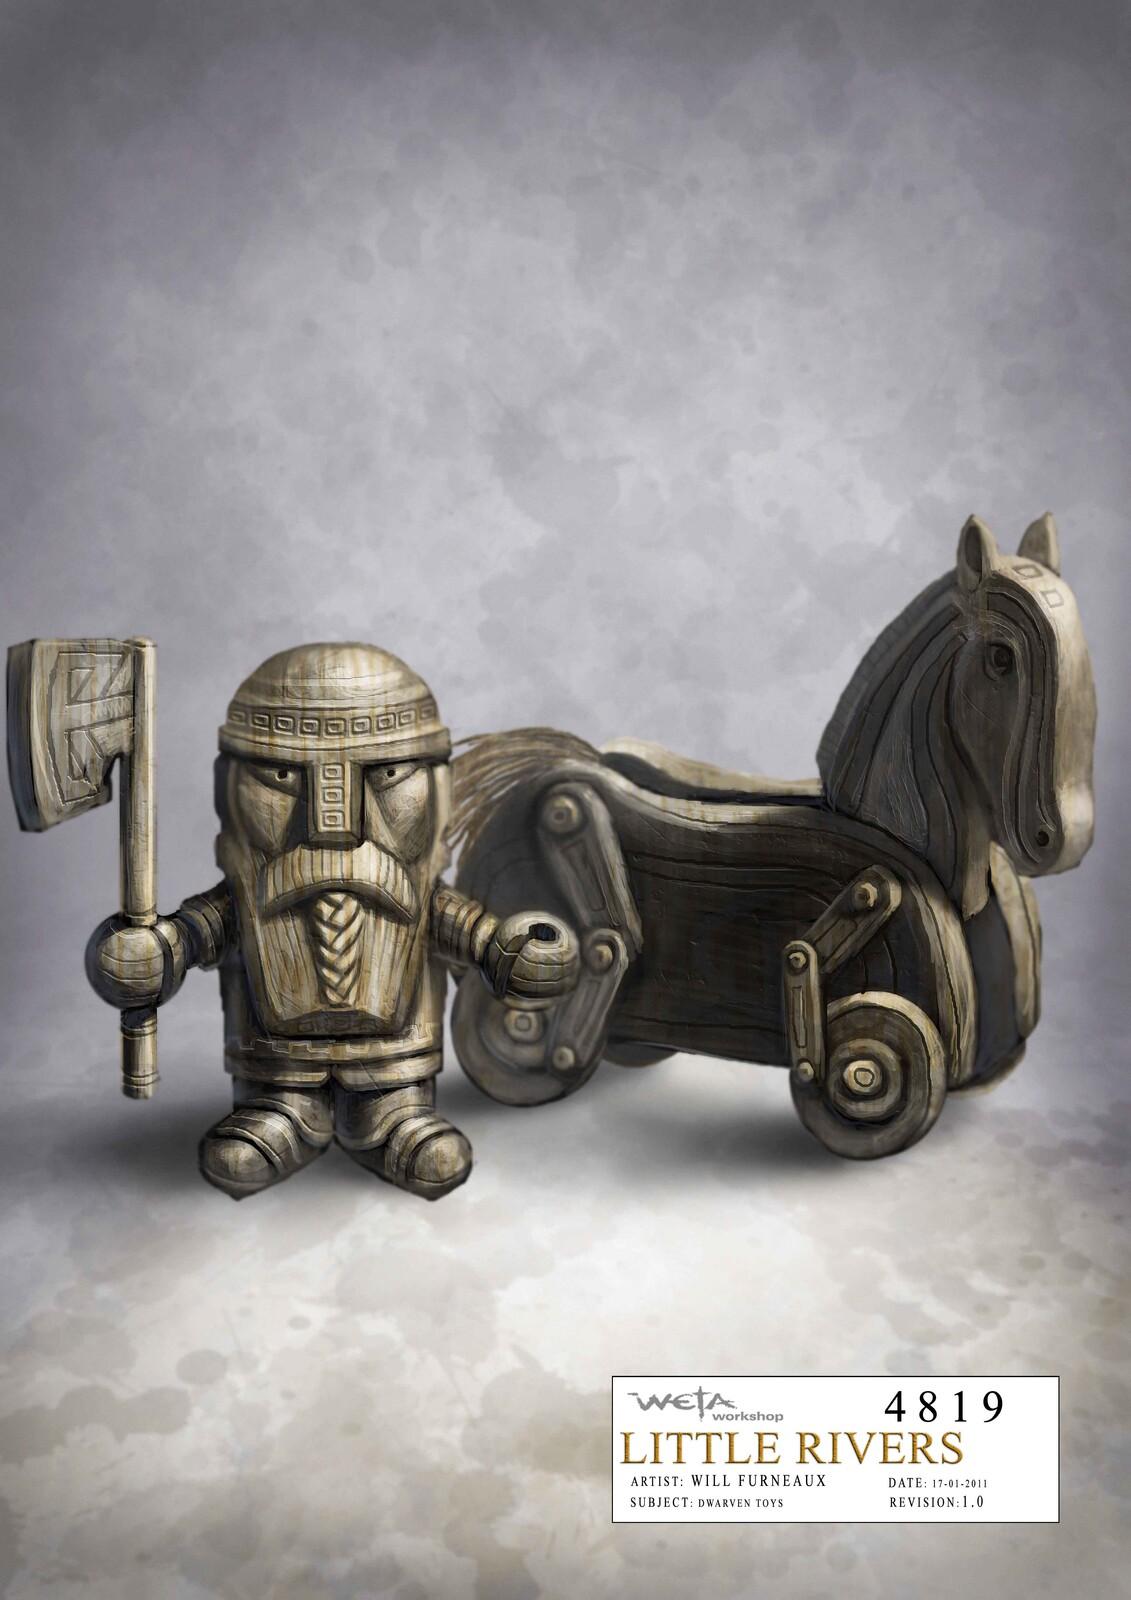 Hobbit - Dwarven toys